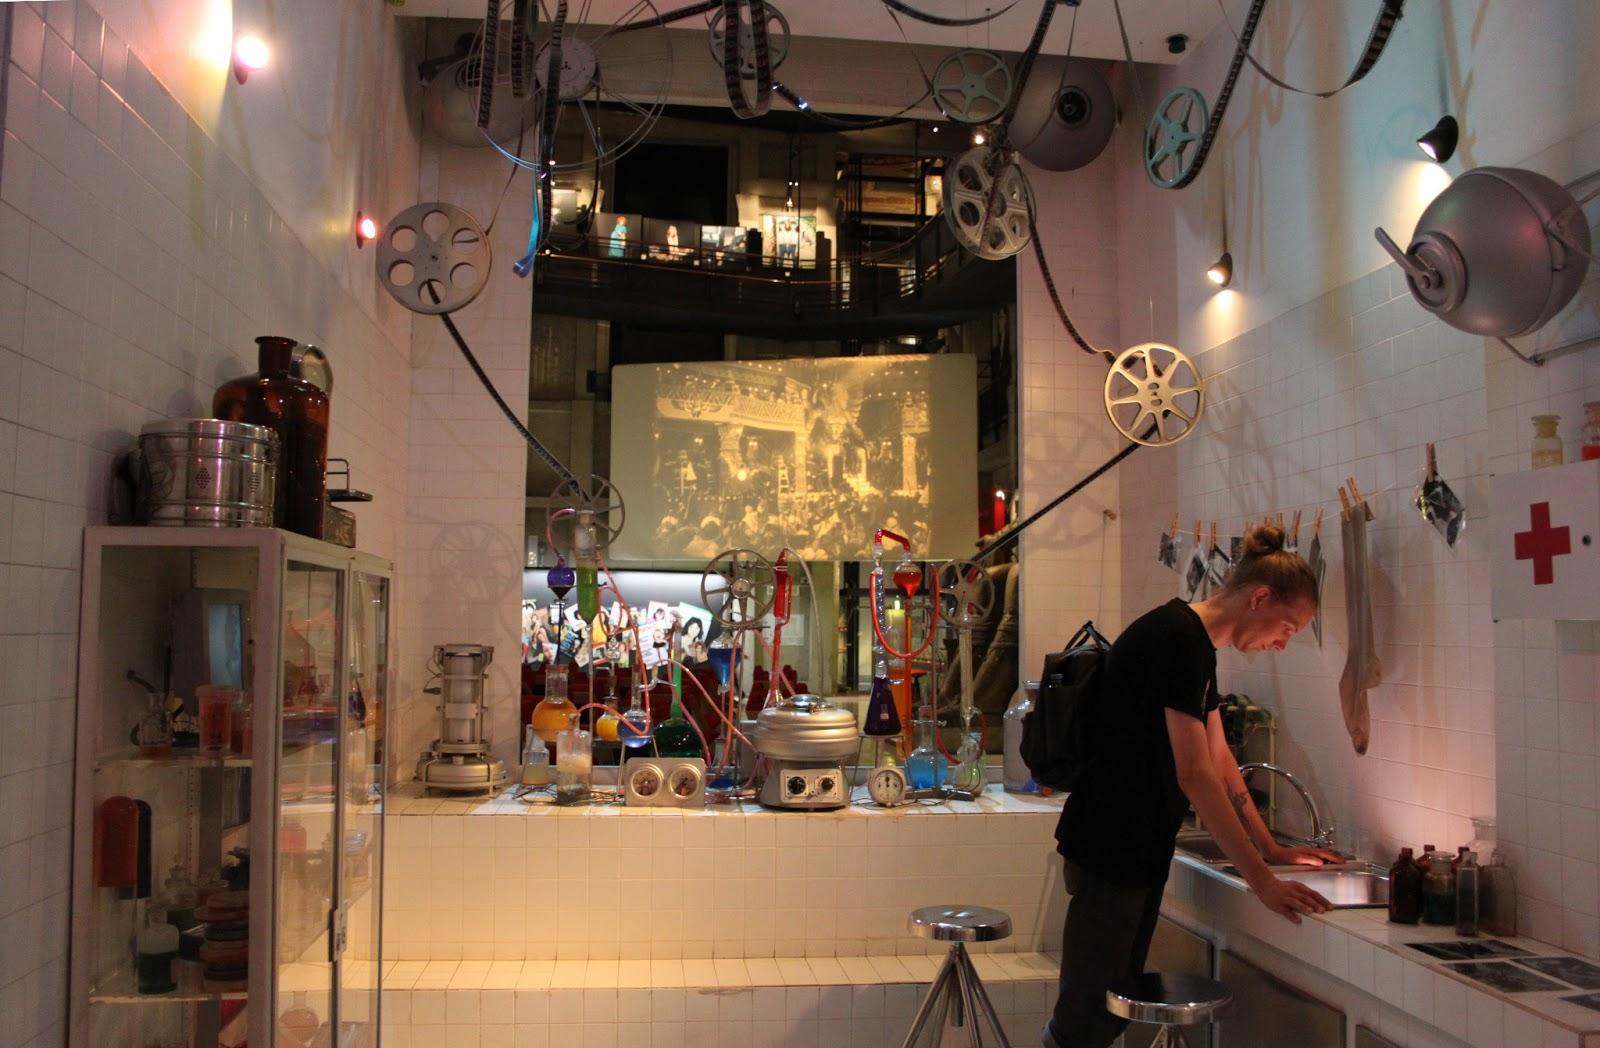 Museo Del Cinema.The Cinescapader Visiting Museo Nazionale Del Cinema In Turin Italy